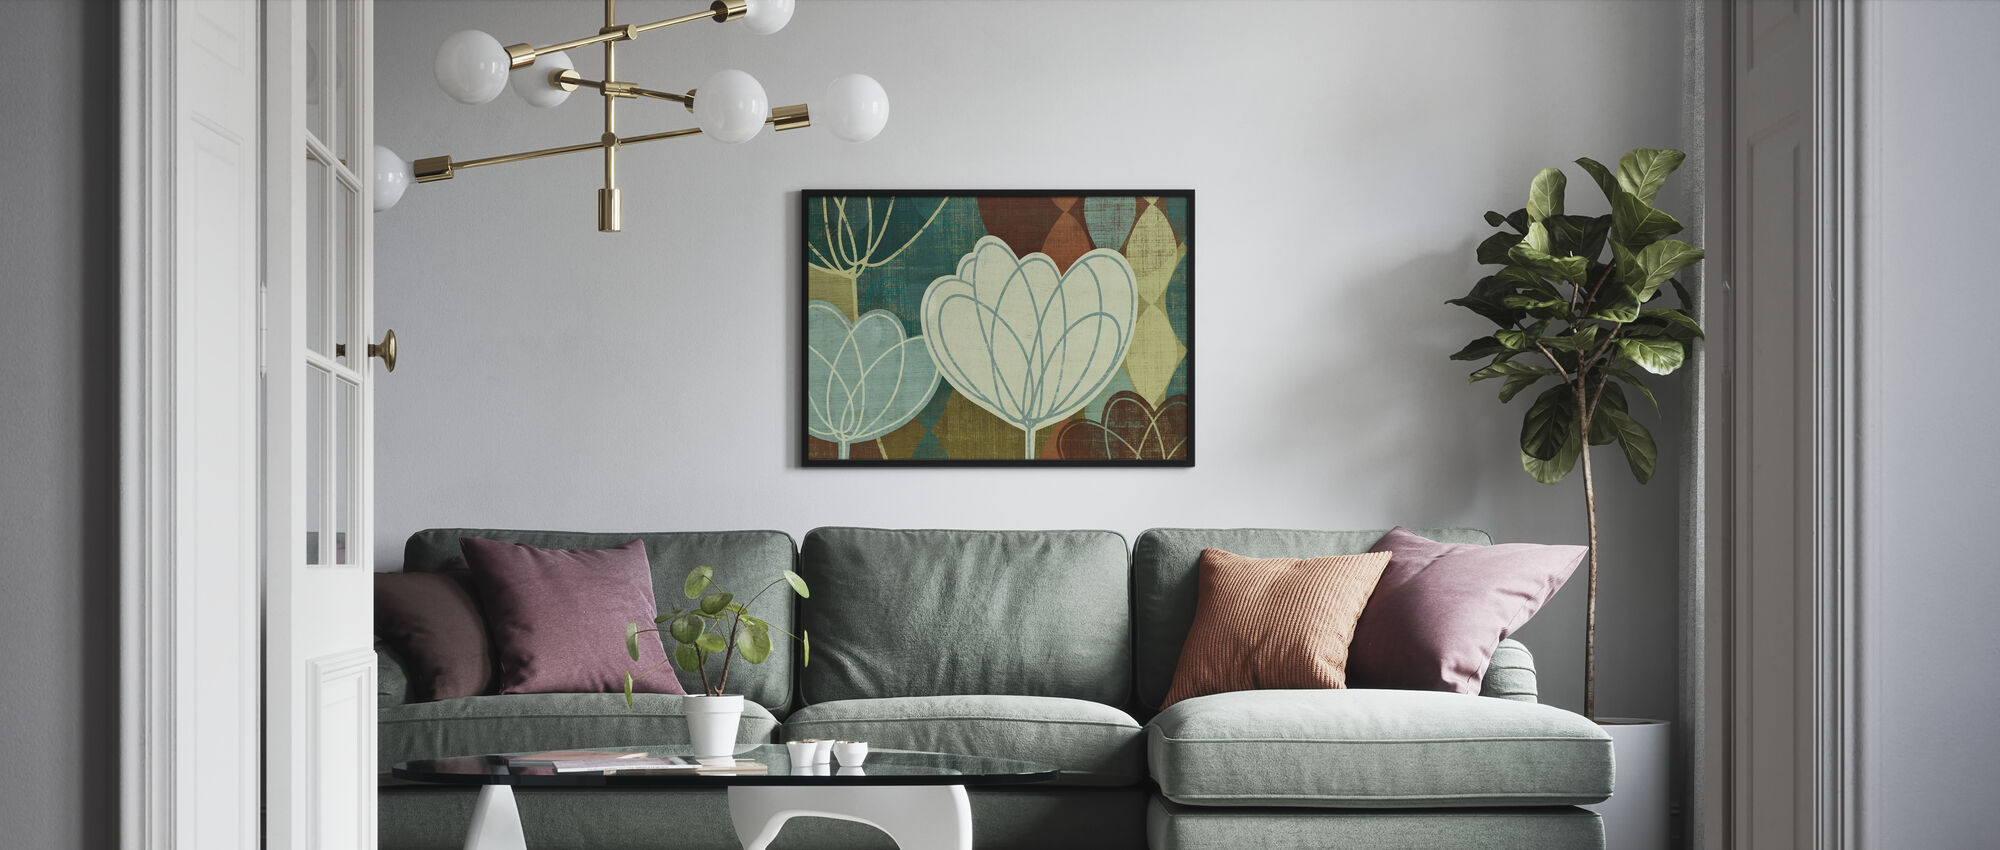 Våren tulpan - Inramad tavla - Vardagsrum